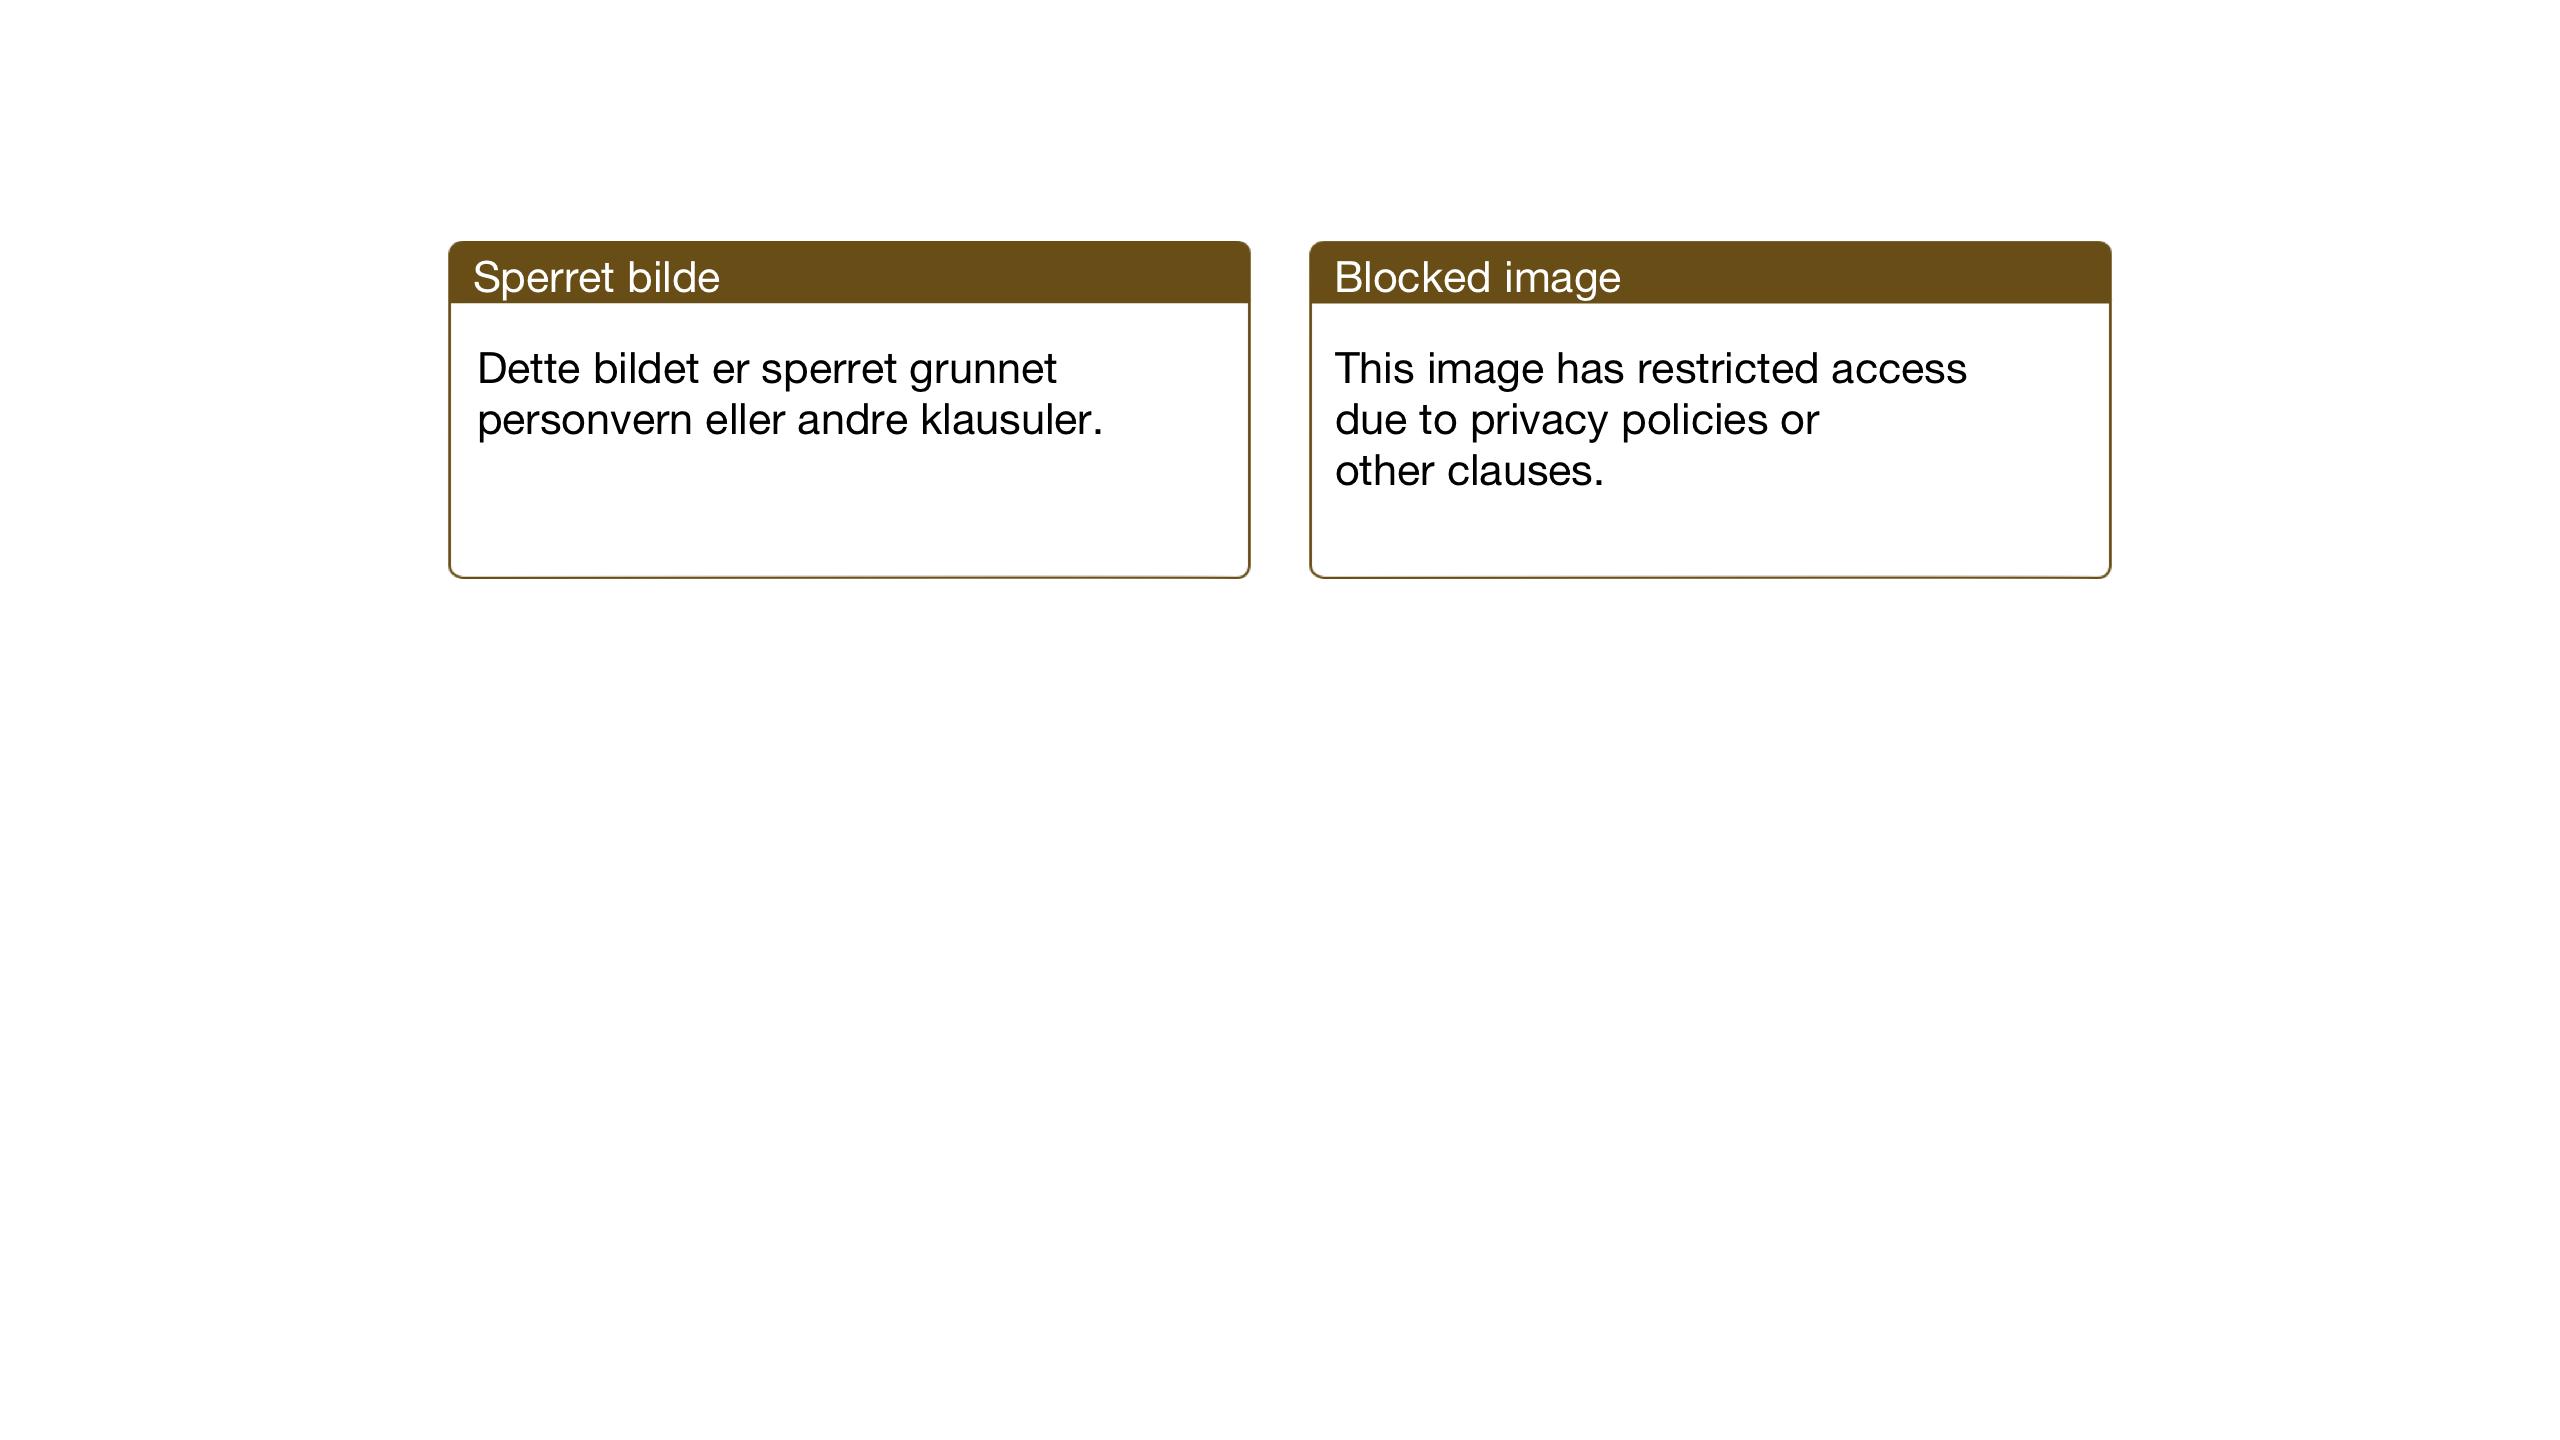 SAH, Vardal prestekontor, H/Ha/Haa/L0018: Ministerialbok nr. 18, 1930-1945, s. 160